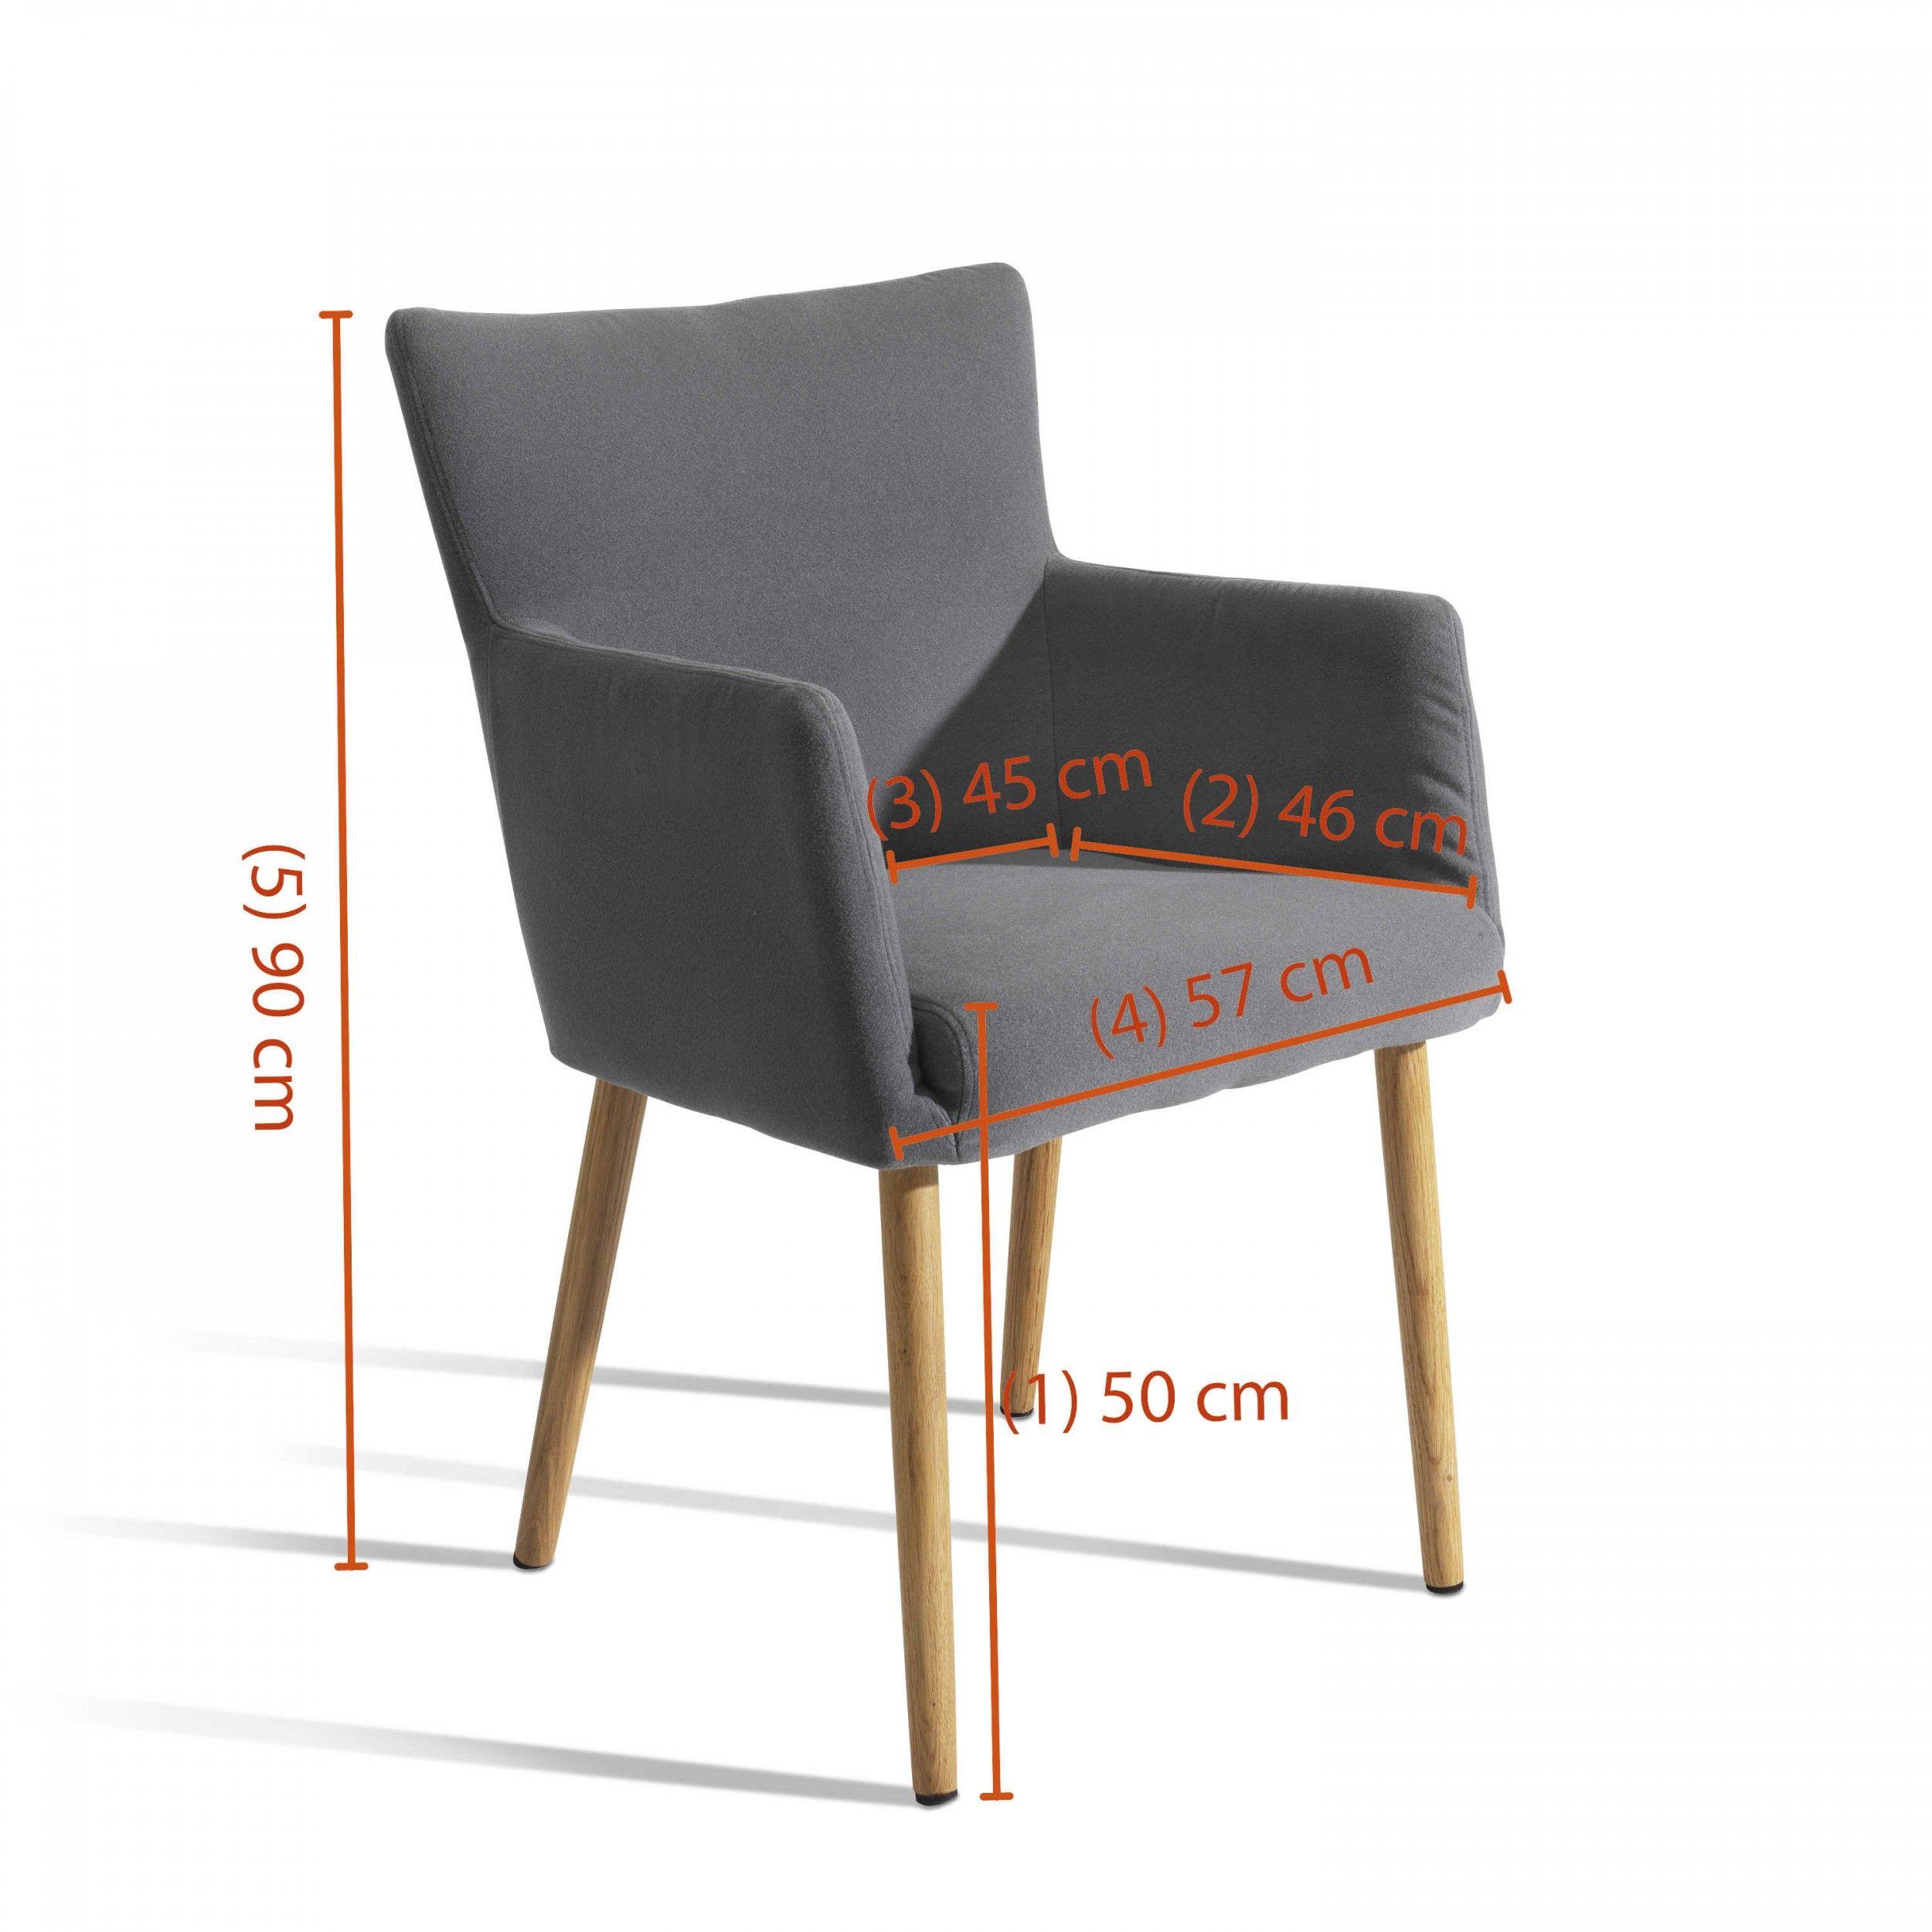 Stuhl, Hellgrau Lamole   4 Fuß Stühle   Stühle U0026 Freischwinger   Esszimmer    Möbel